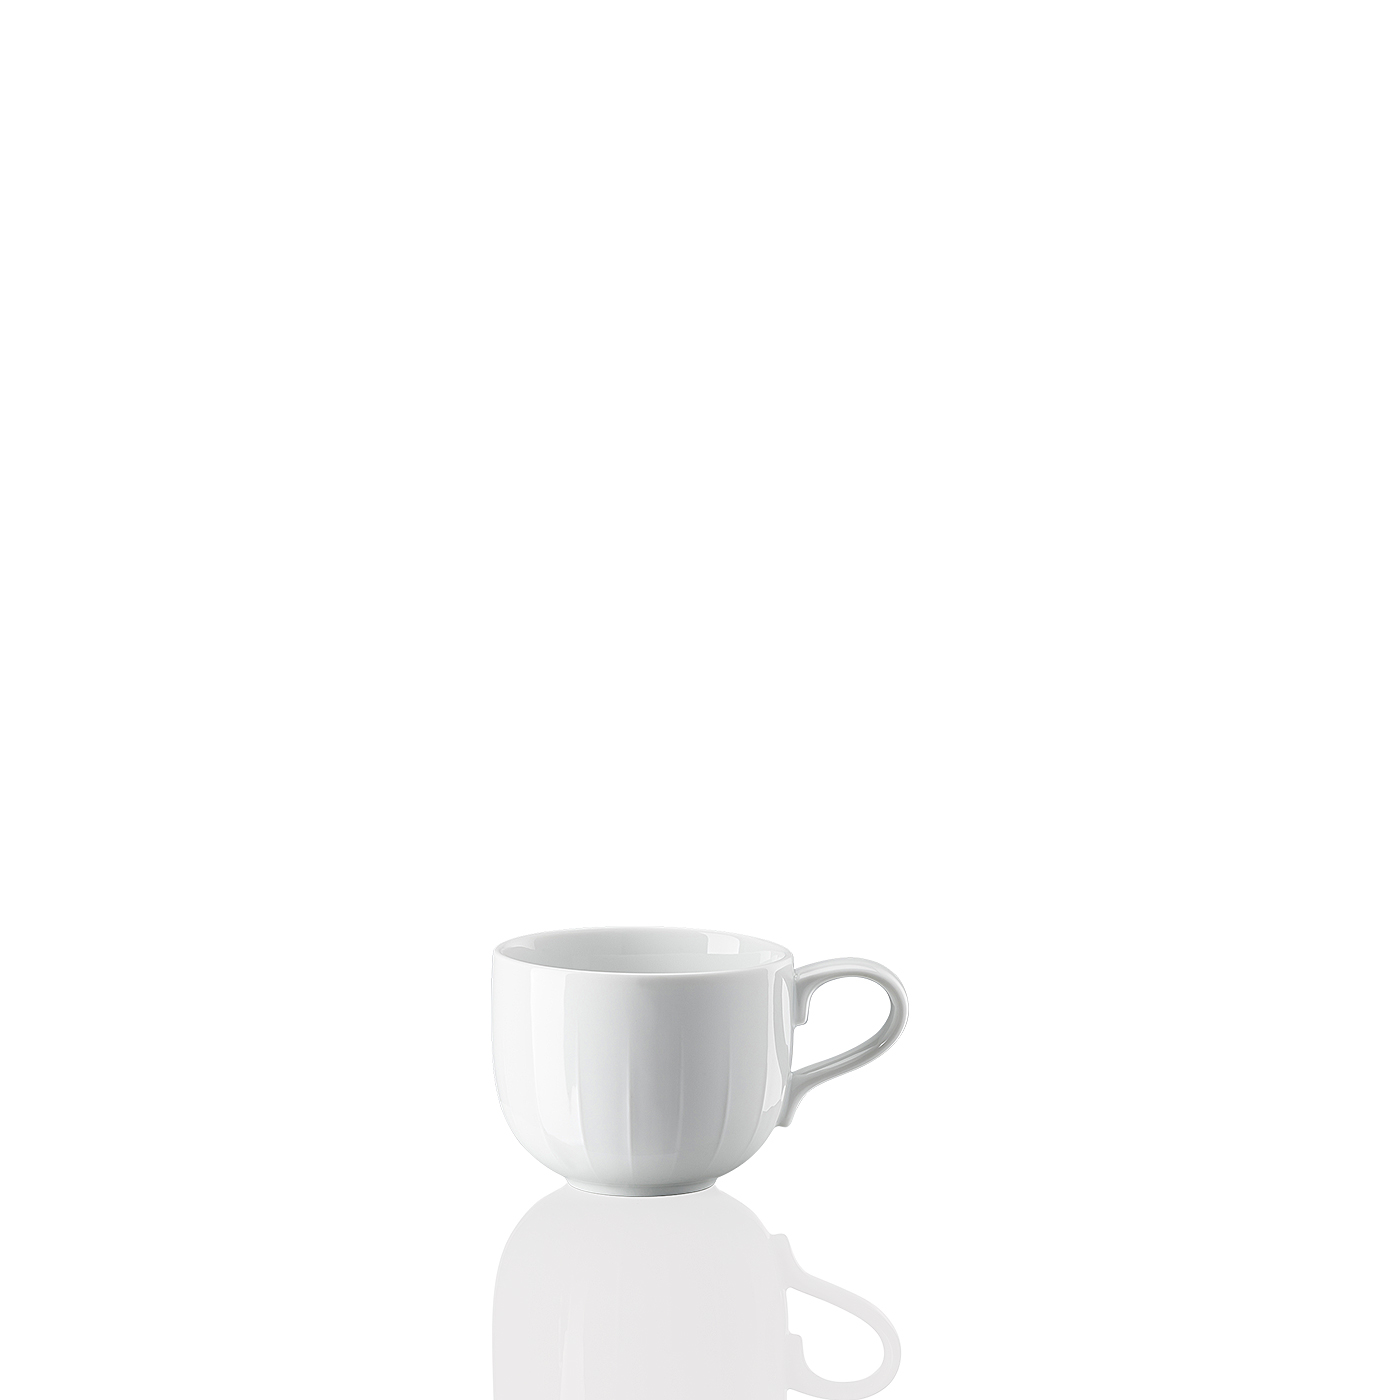 Kaffee-Obertasse Joyn Weiß Arzberg